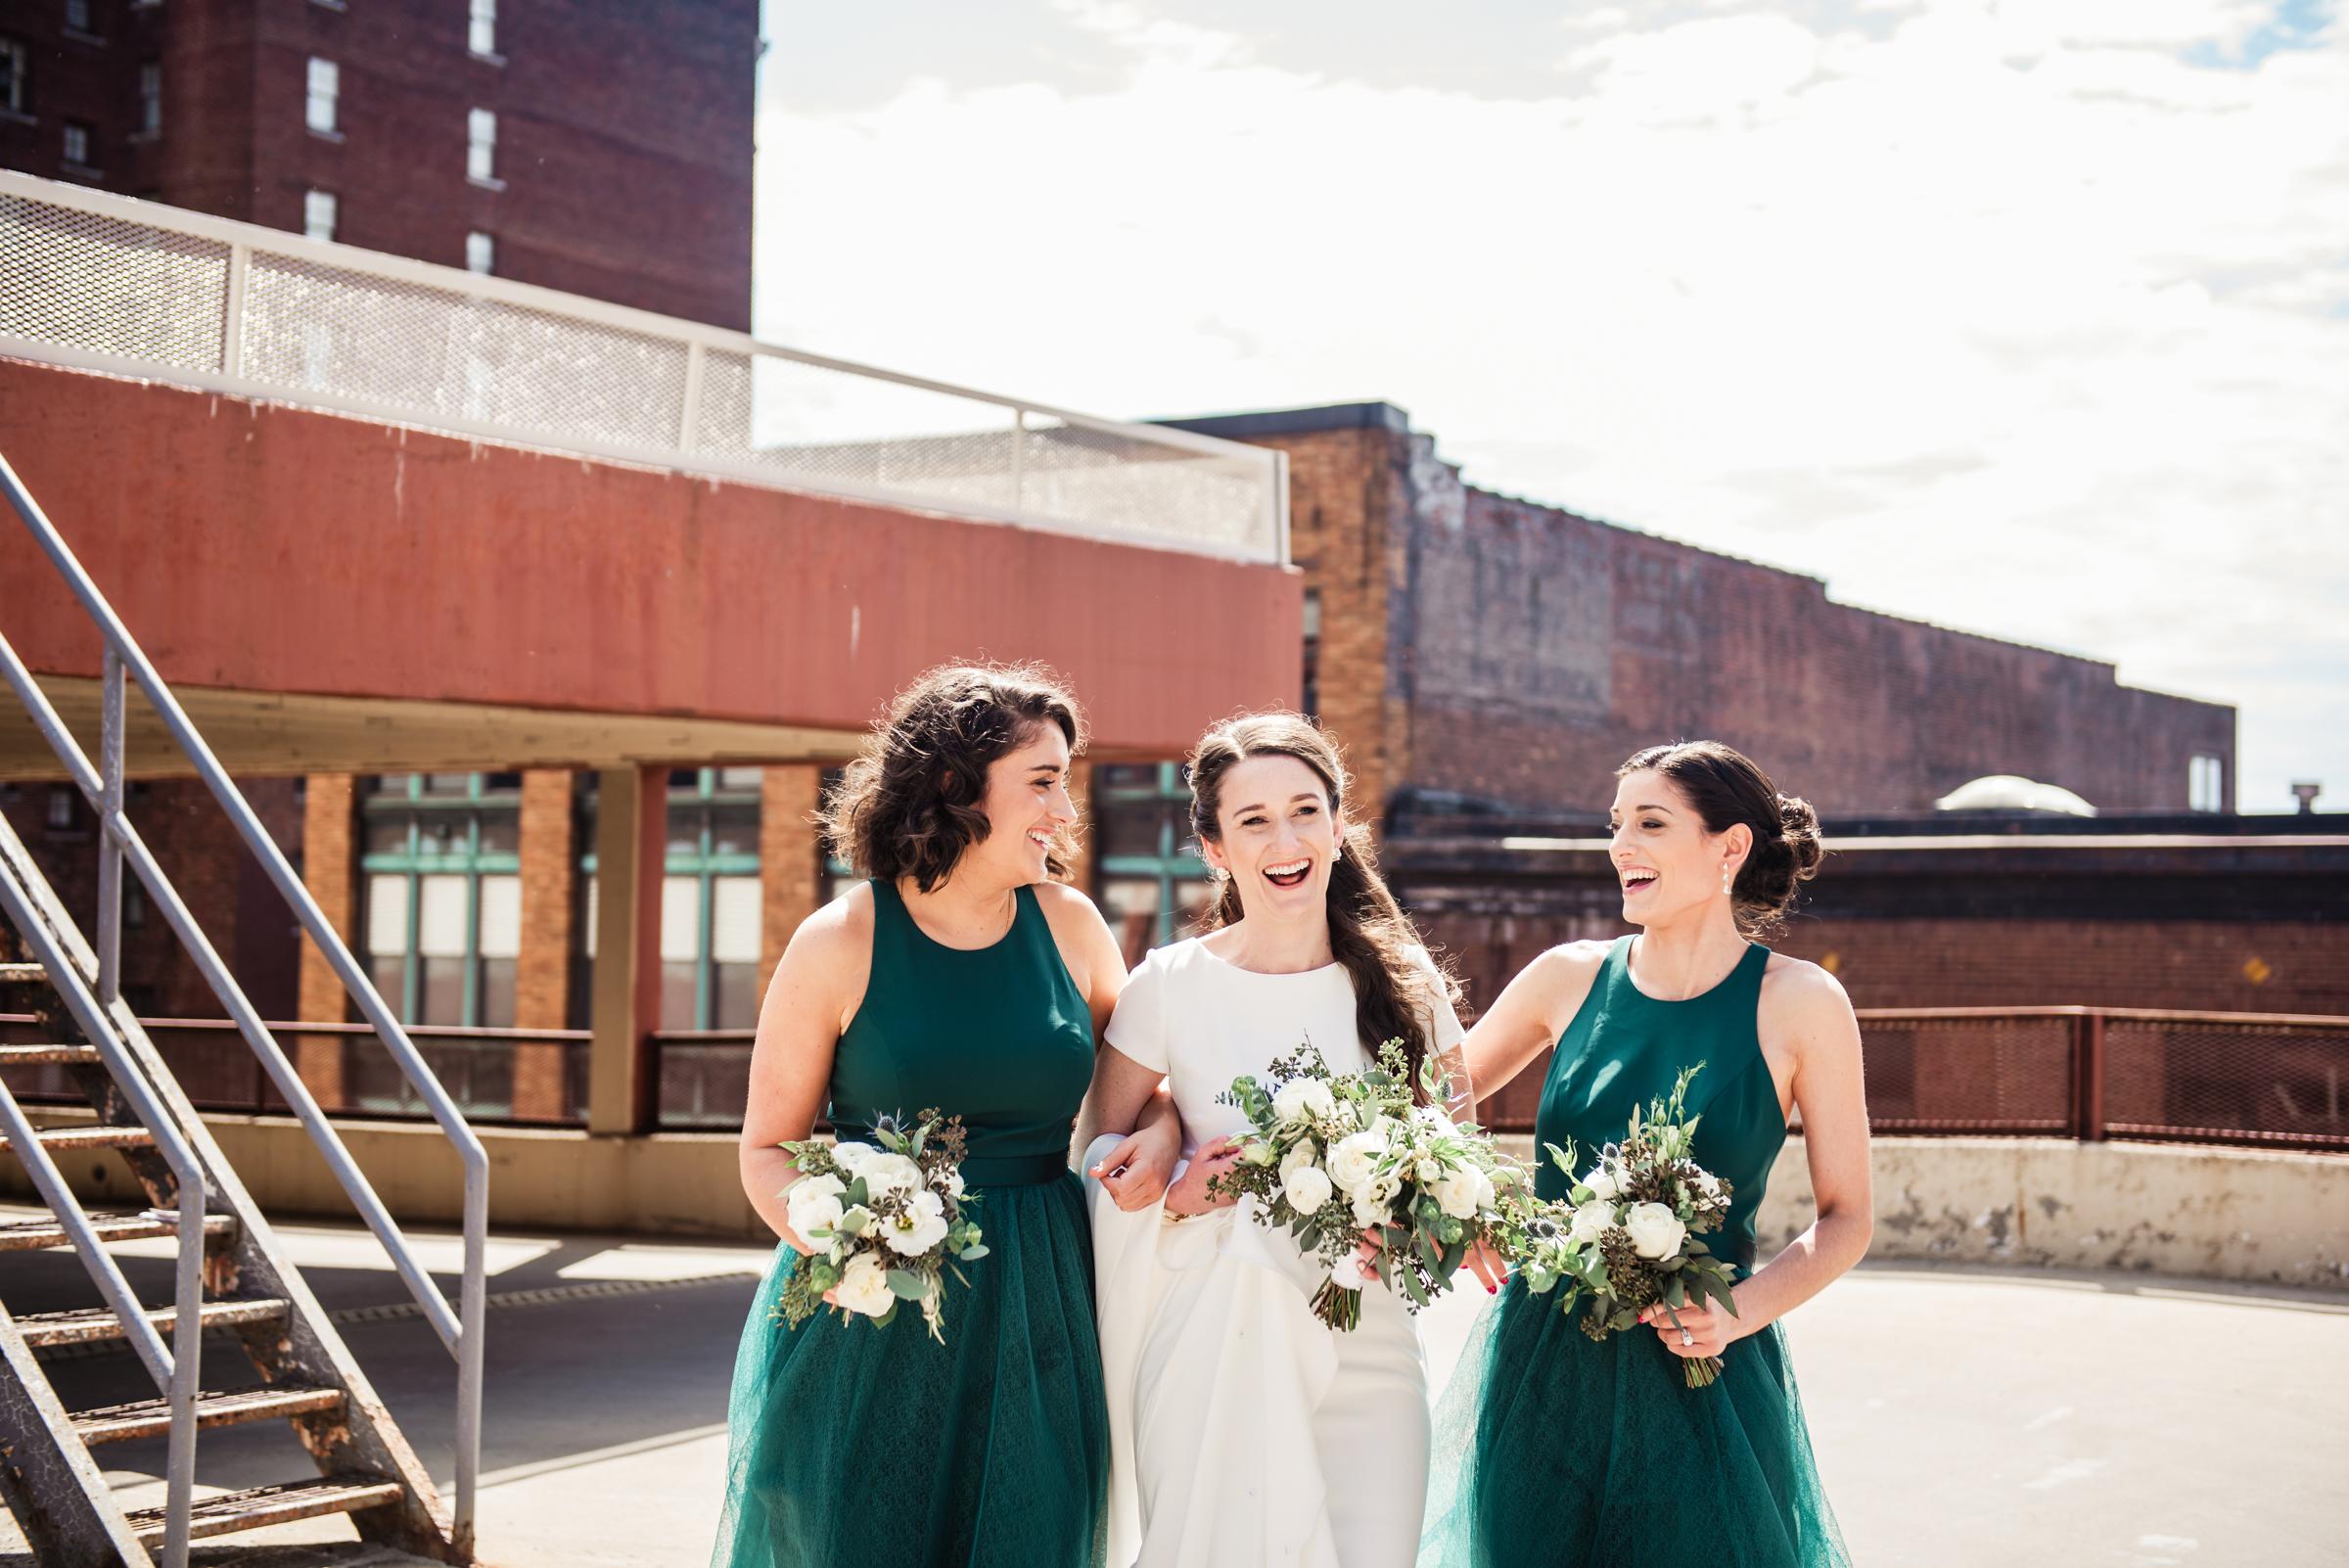 SKY_Armory_Syracuse_Wedding_JILL_STUDIO_Rochester_NY_Photographer_DSC_5542.jpg